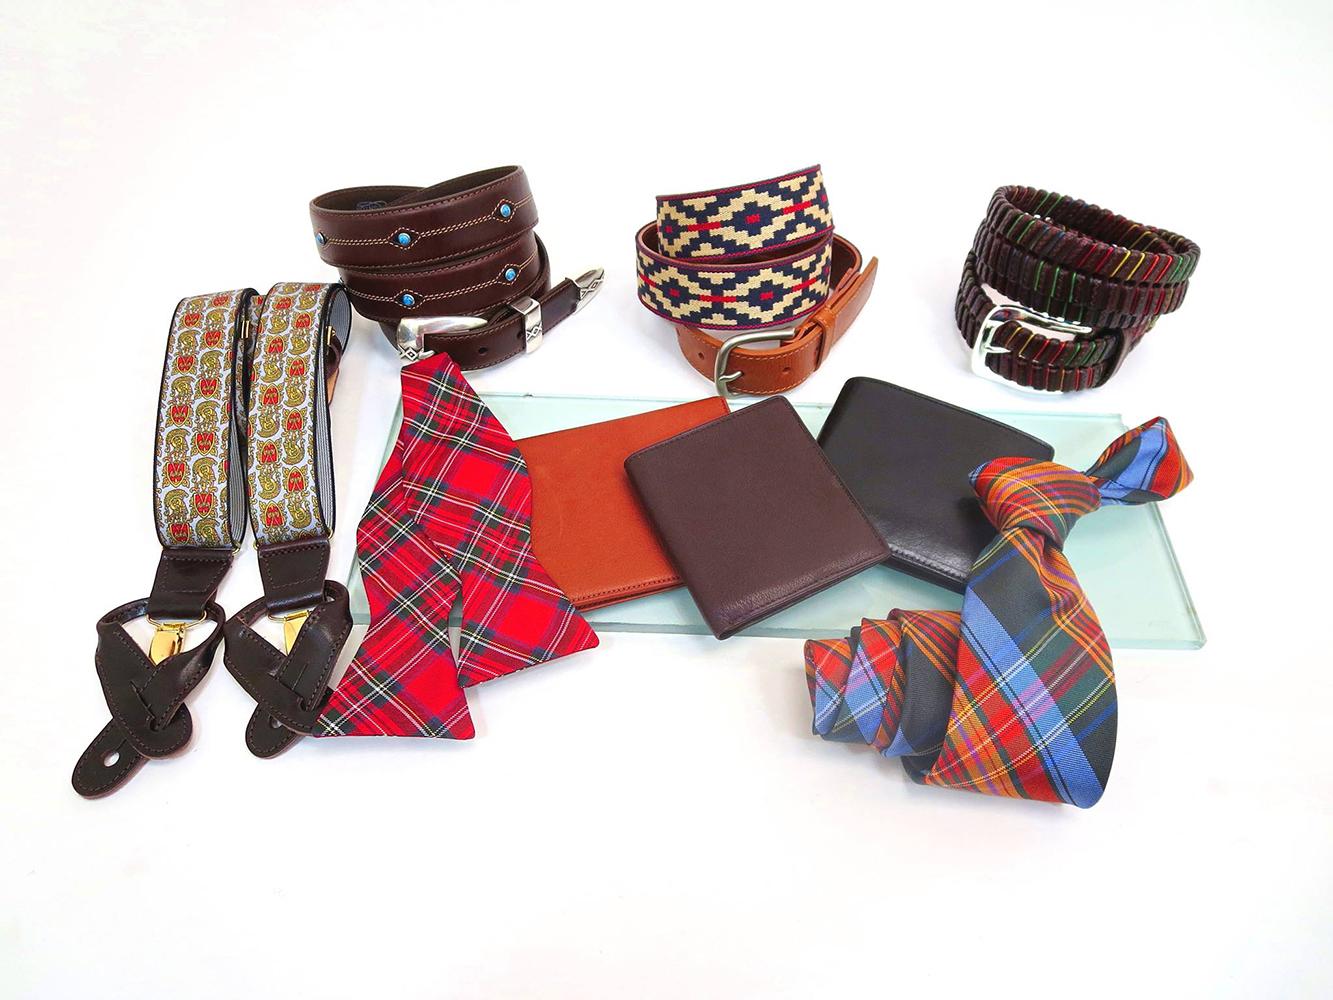 Merchandise Displays - Fashion & Apparel